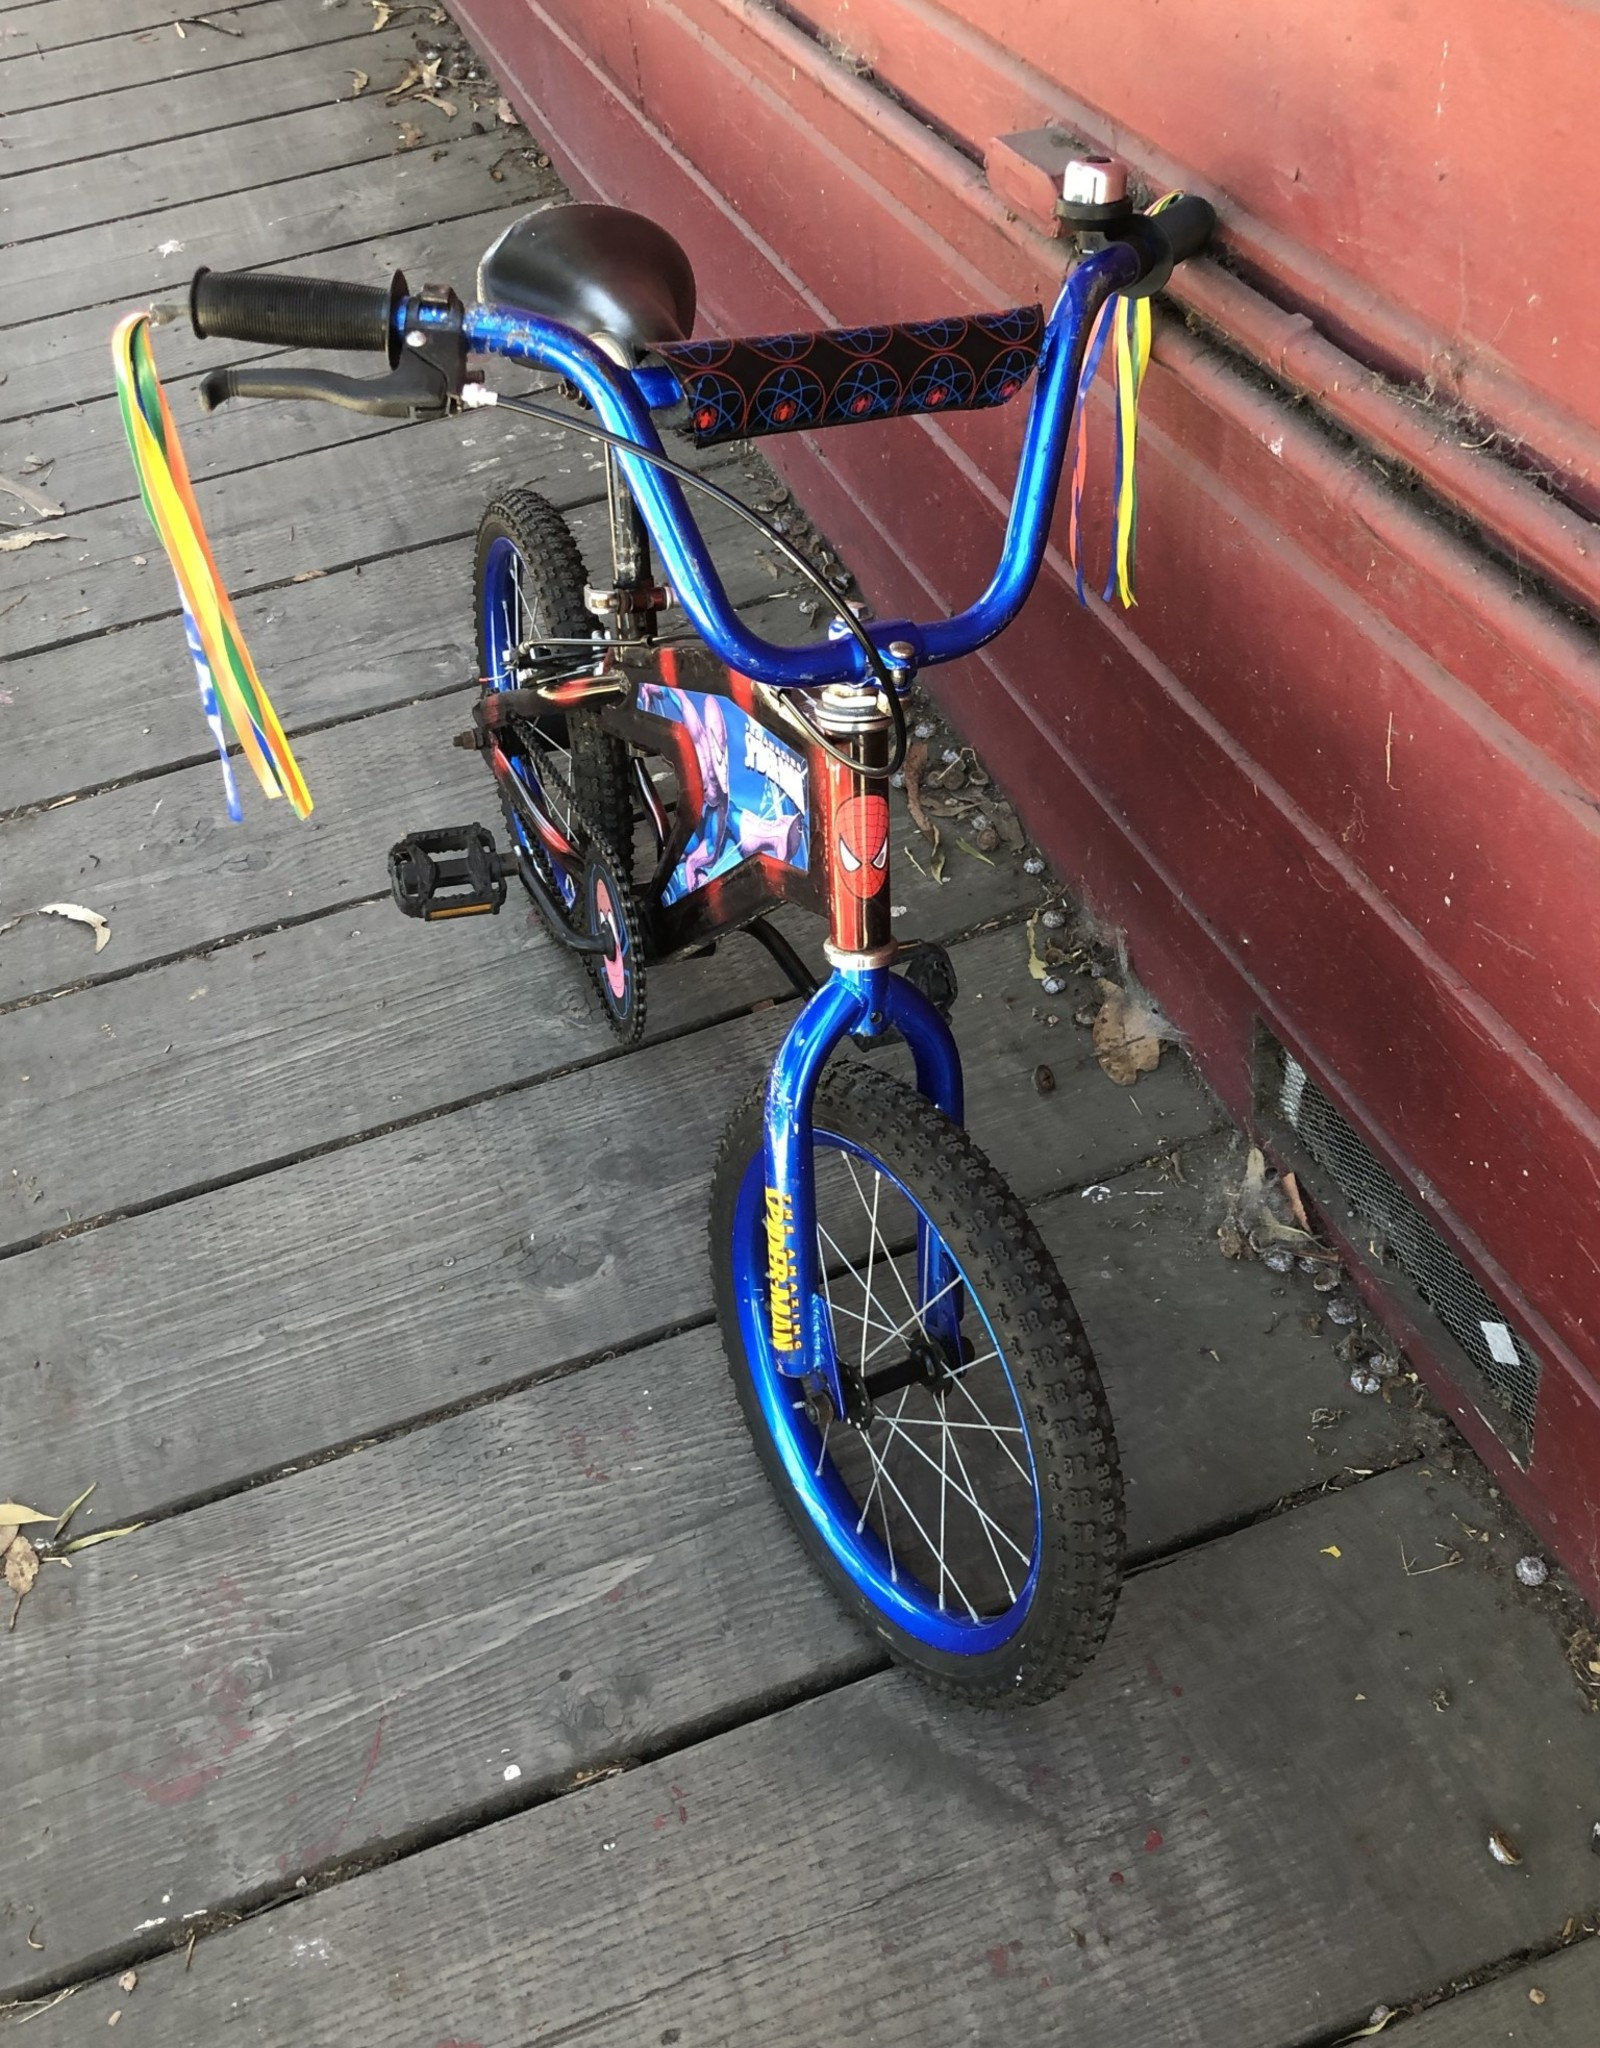 Amazing Spiderman Bike - 16in Wheels